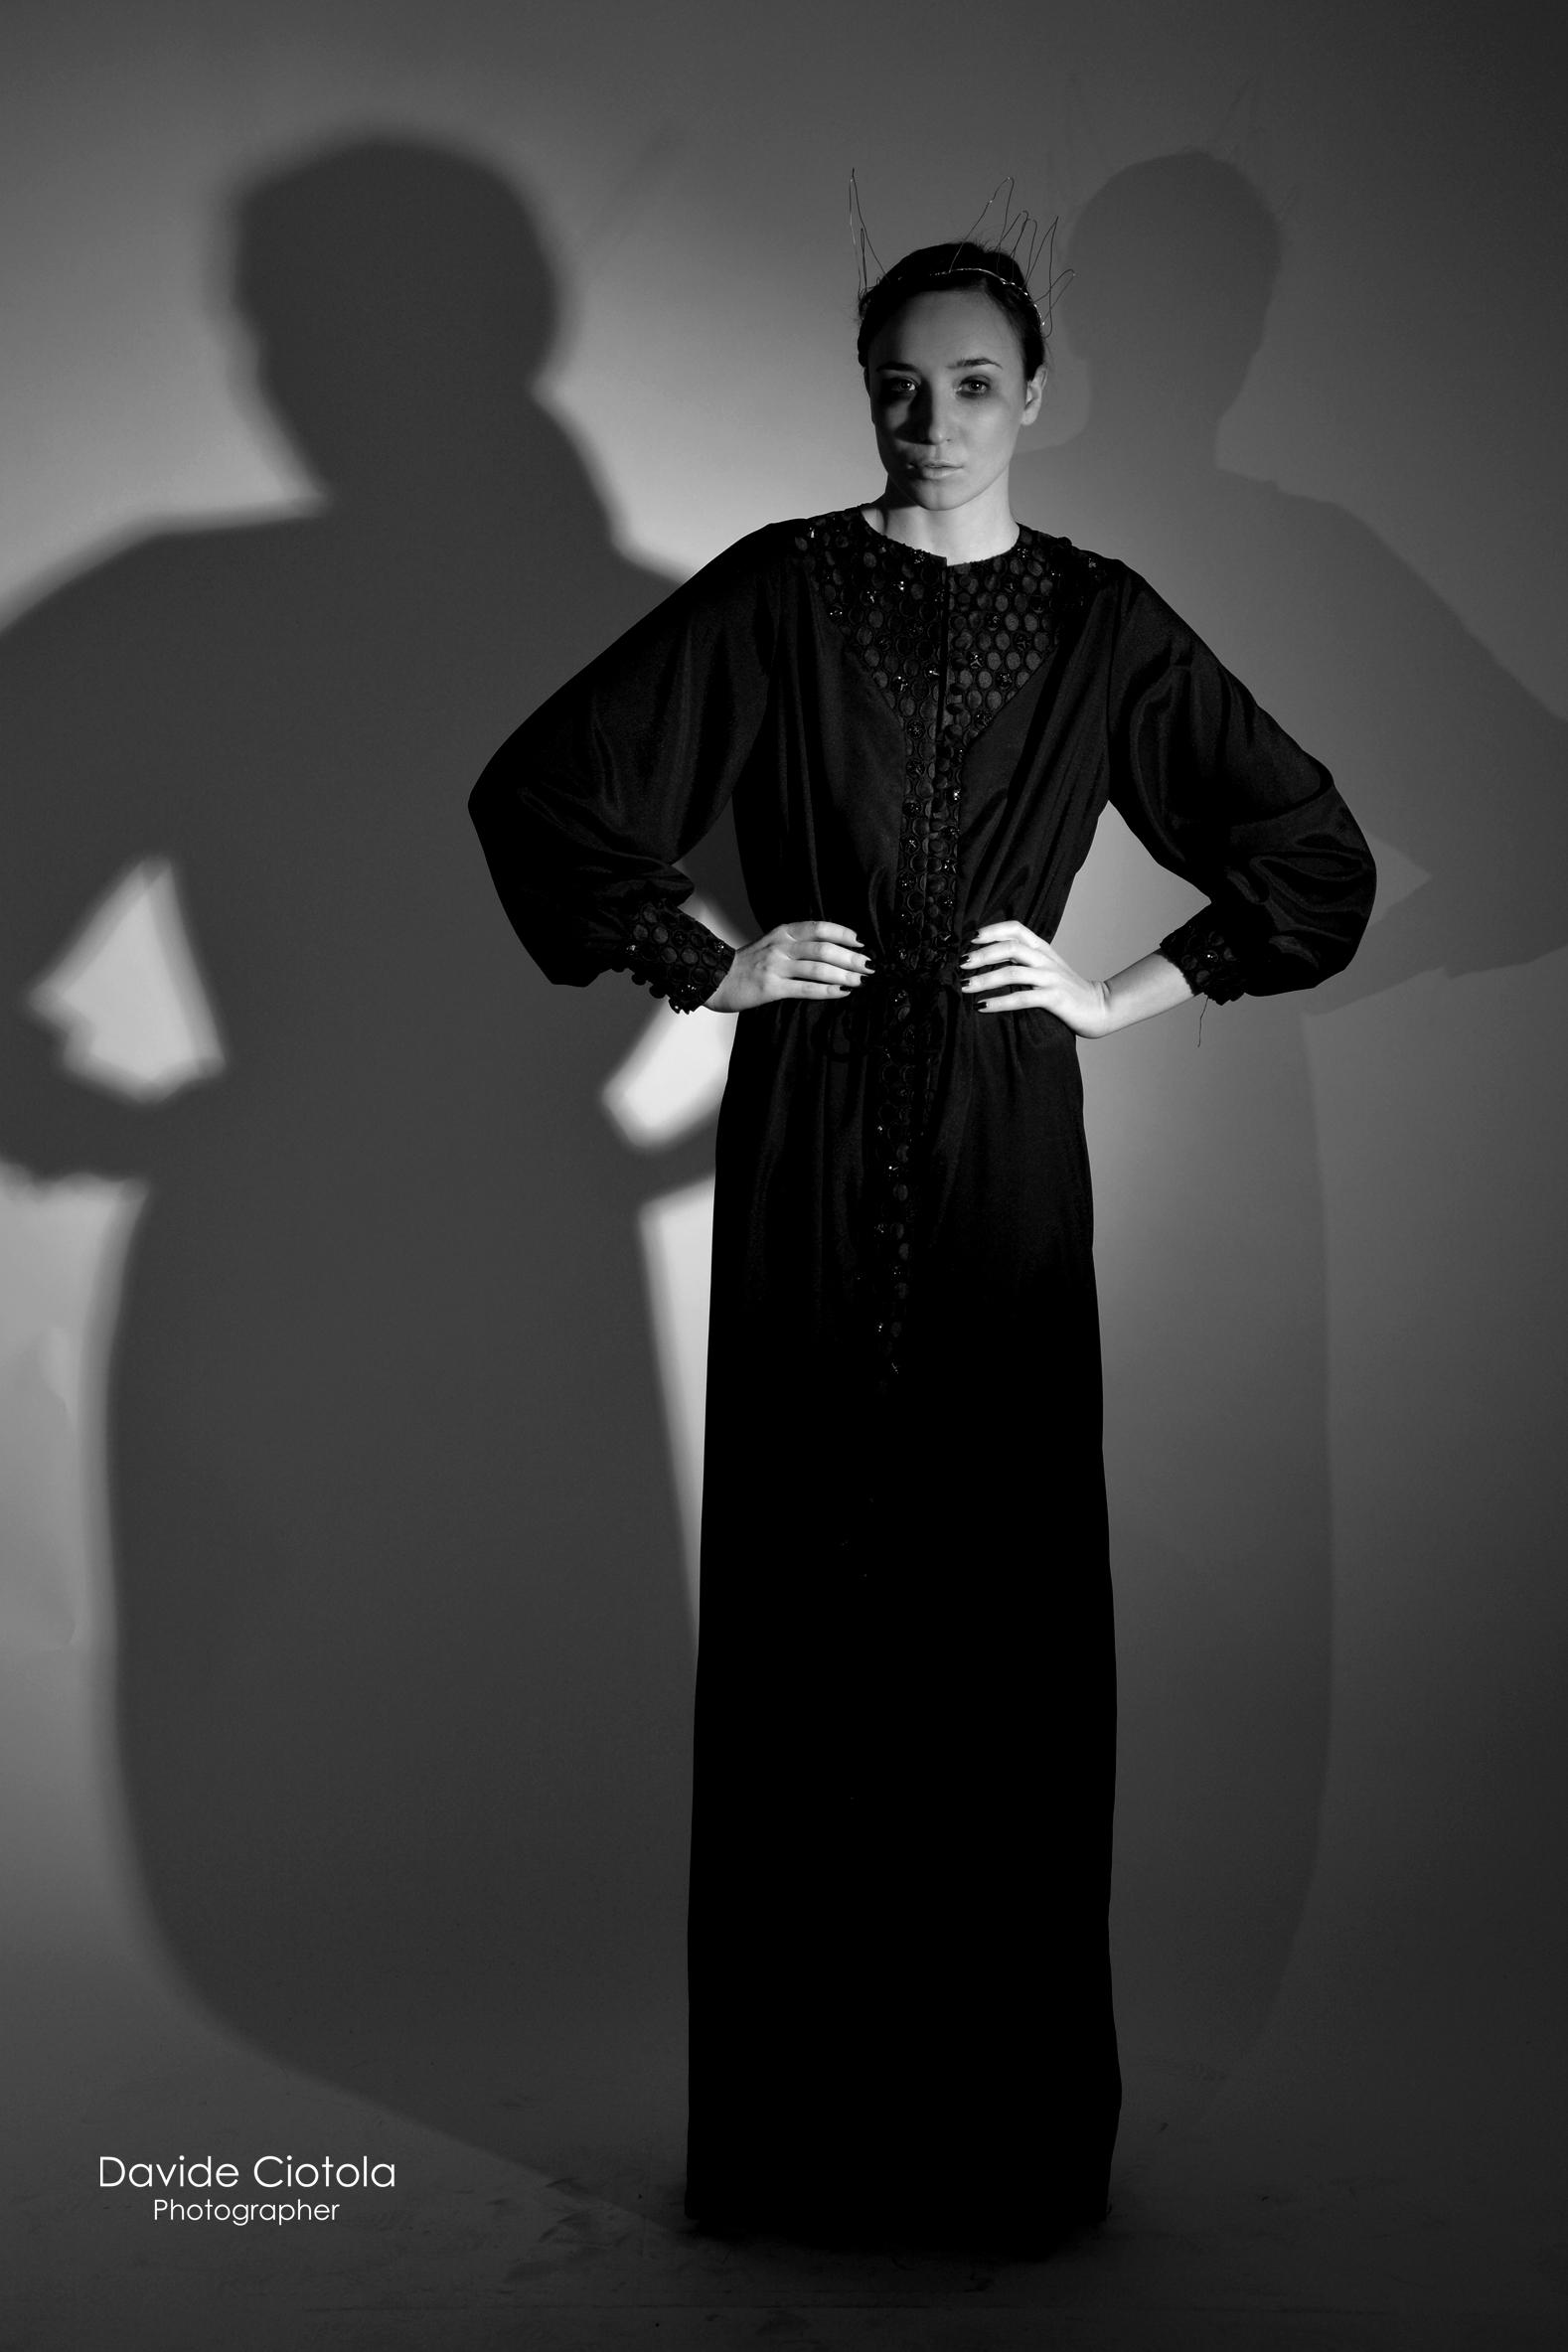 fotografi moda napoli davide ciotola